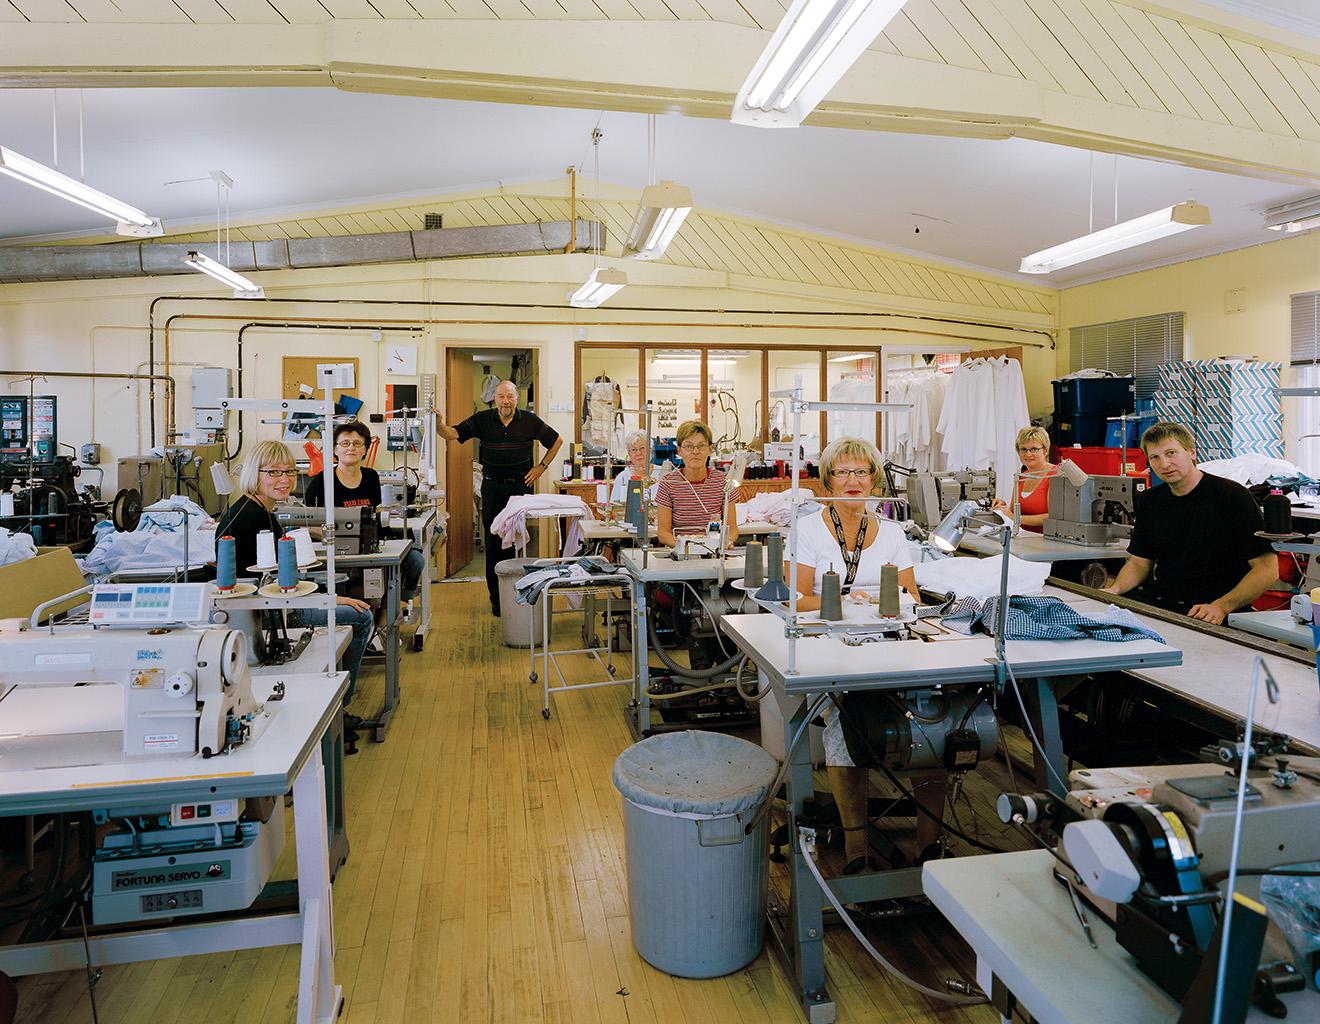 The Kihlén clothing workshop, Hökerum, 19 September 2006